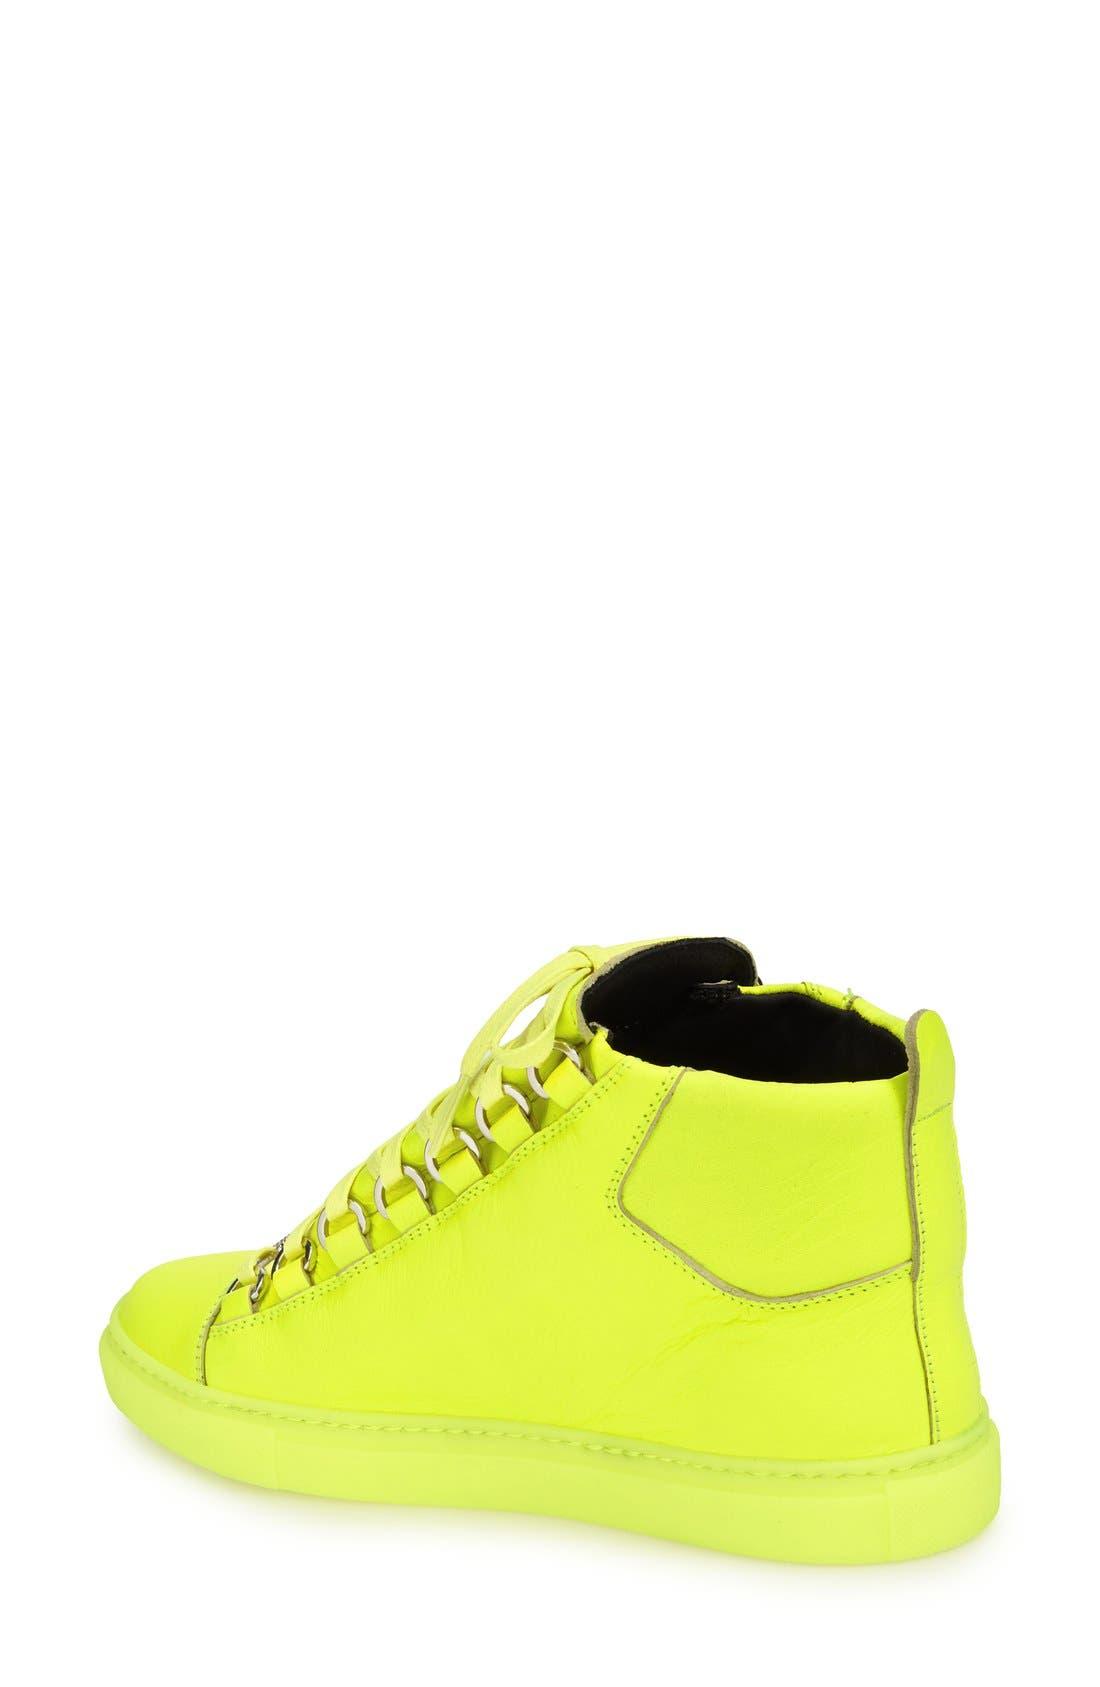 High Top Sneaker,                             Alternate thumbnail 15, color,